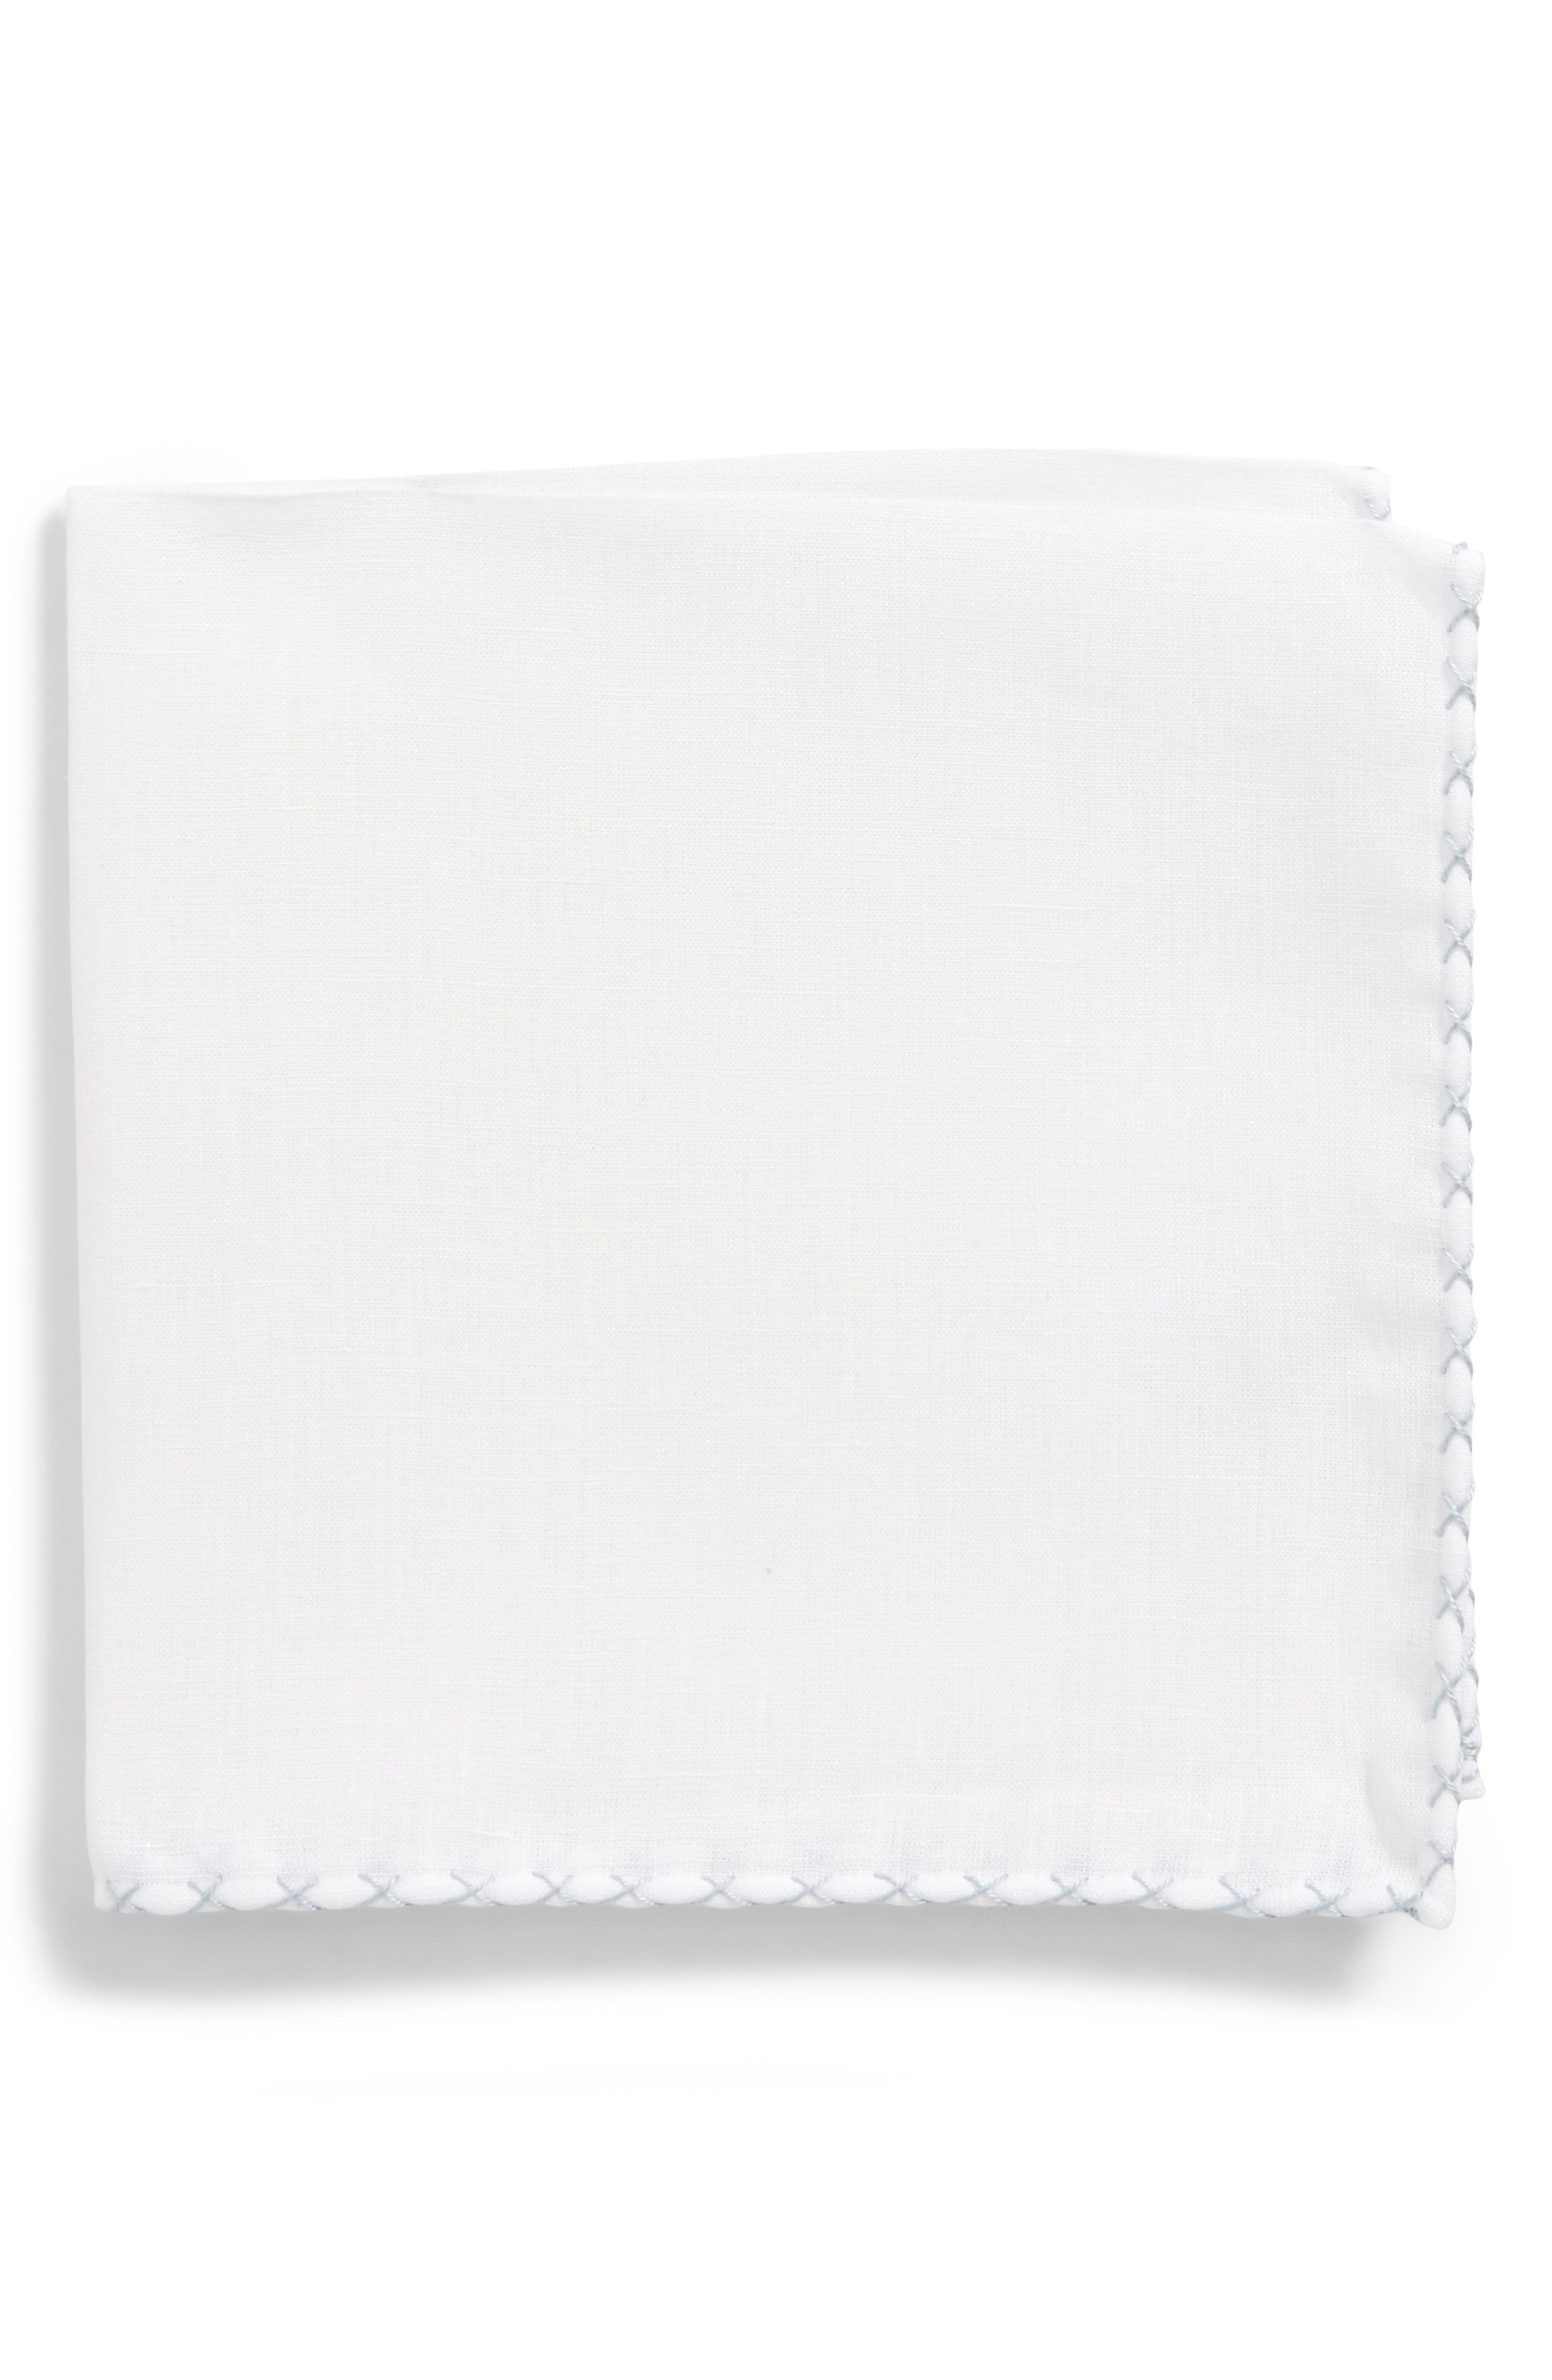 Solid Linen Pocket Square,                         Main,                         color, White/ Stone